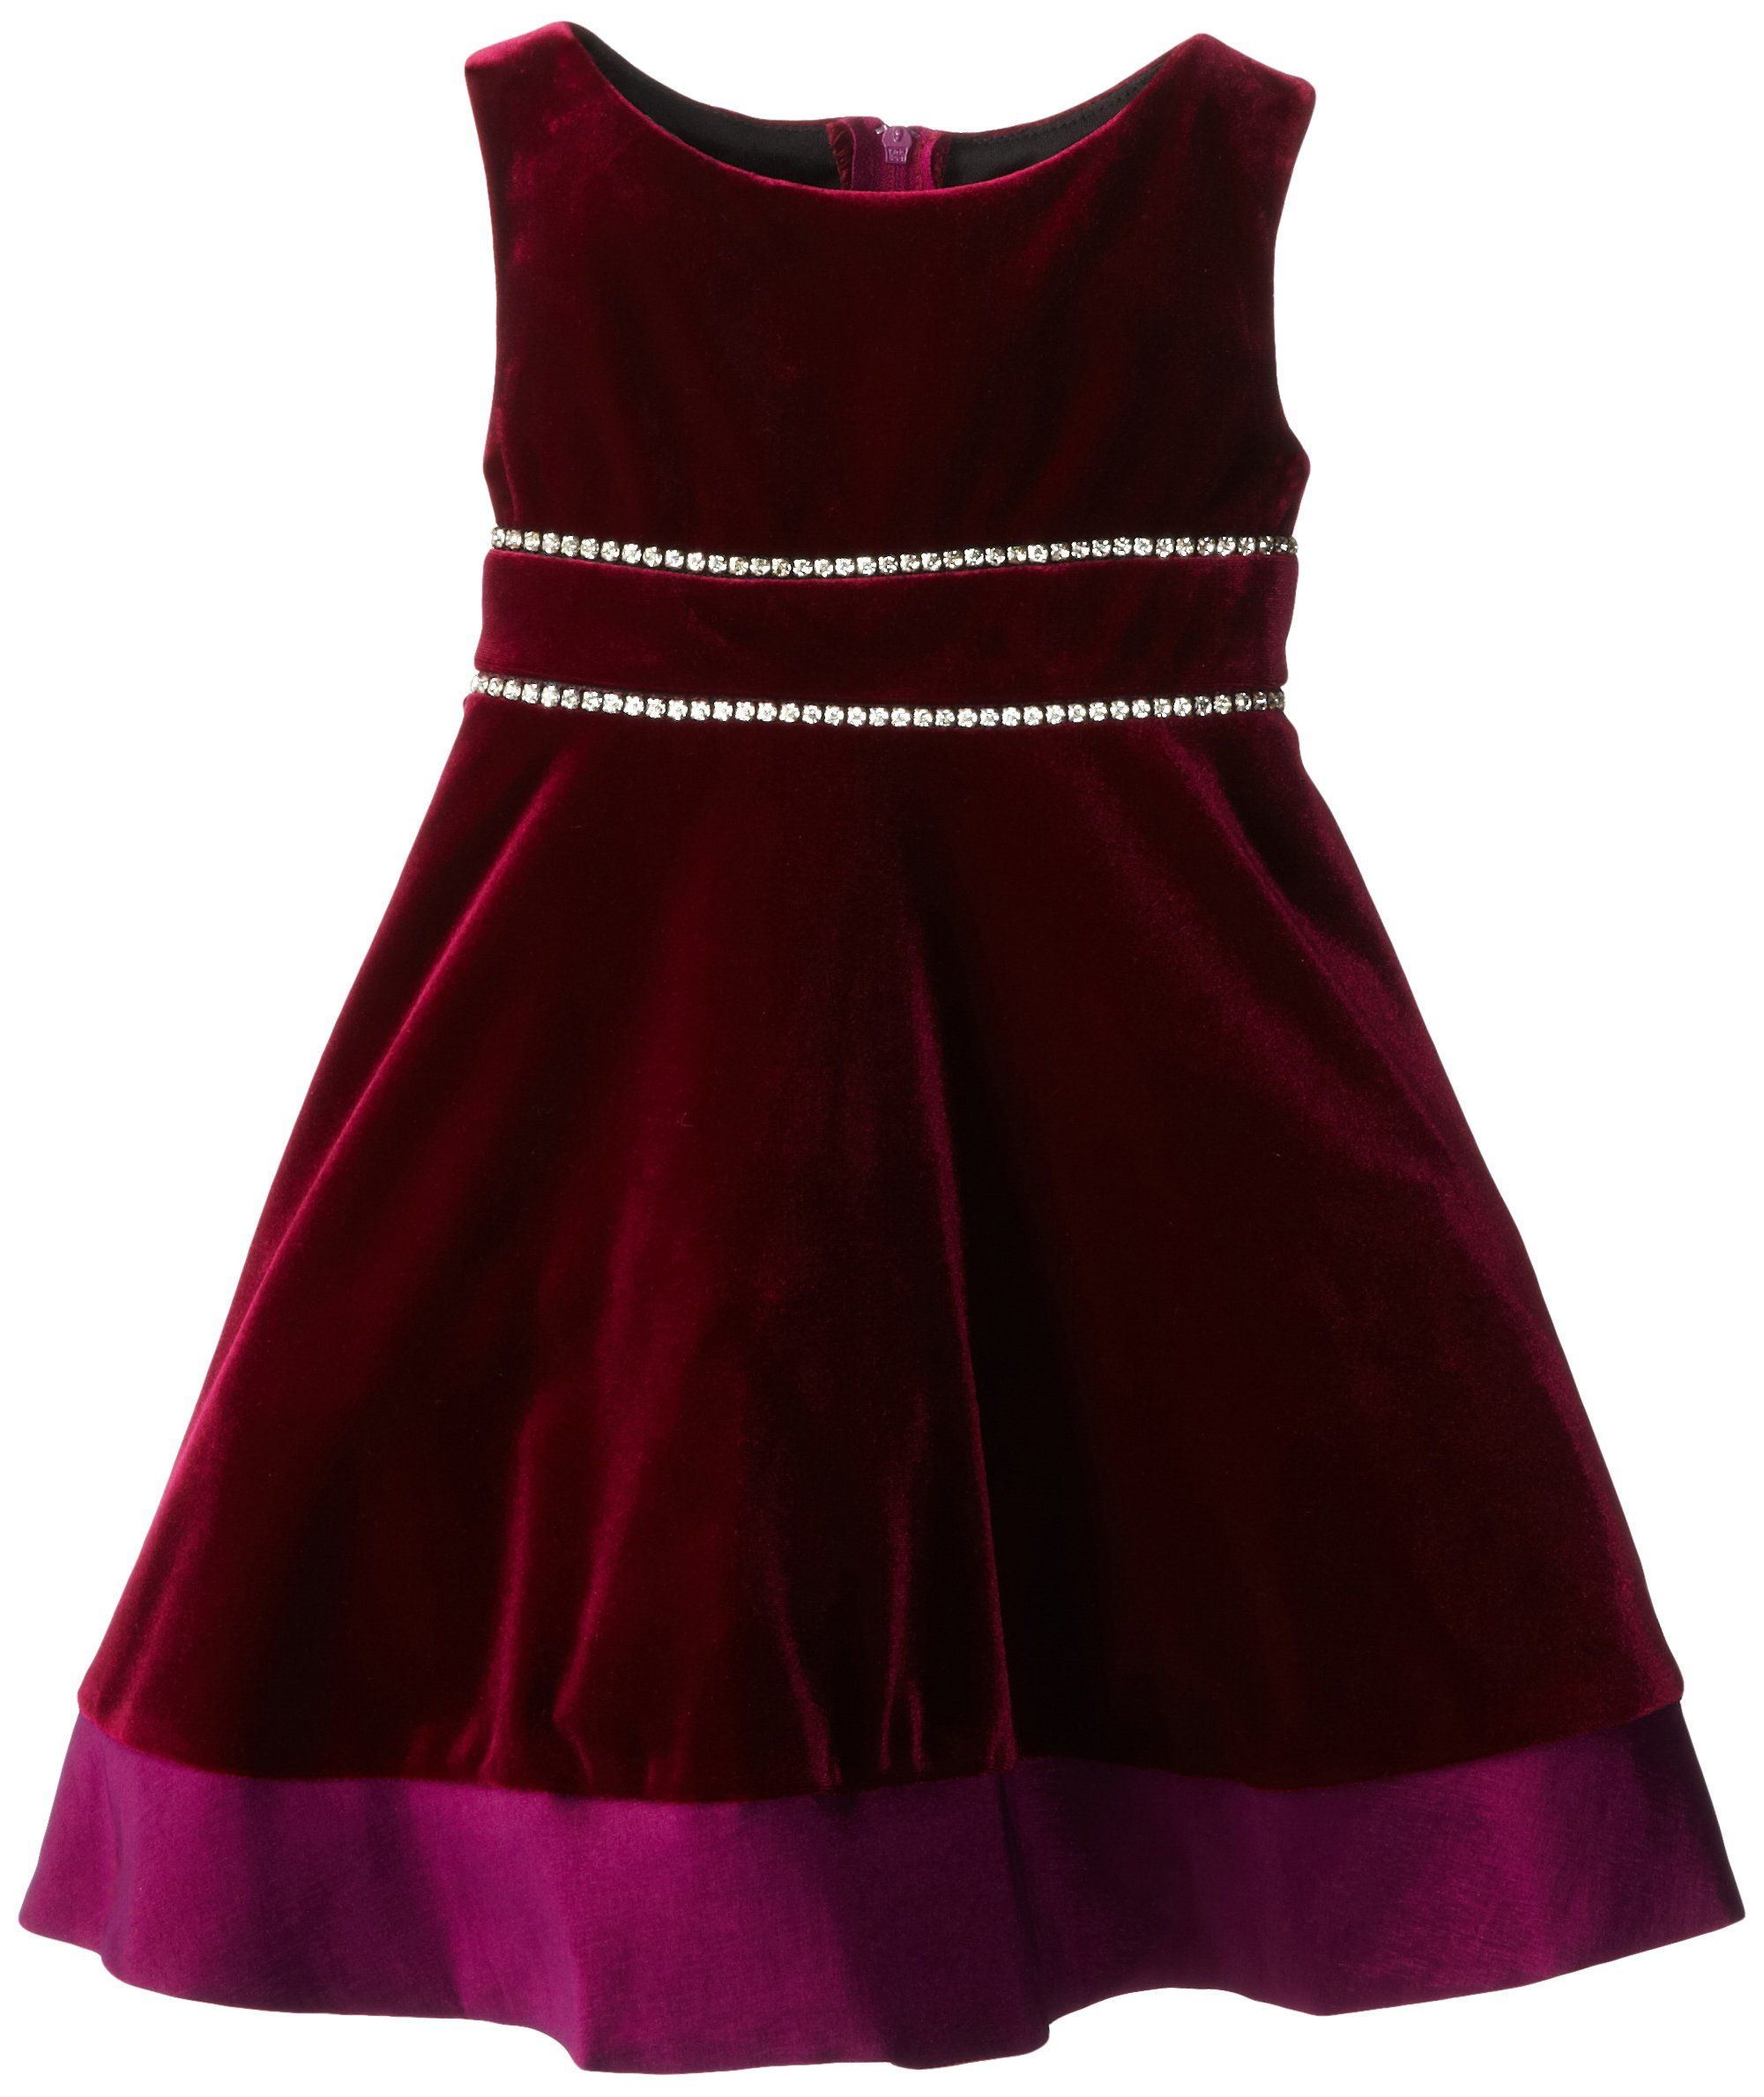 cce32a7ec Amazon.com  Rare Editions Little Girls  Velvet Dress with Taffeta ...